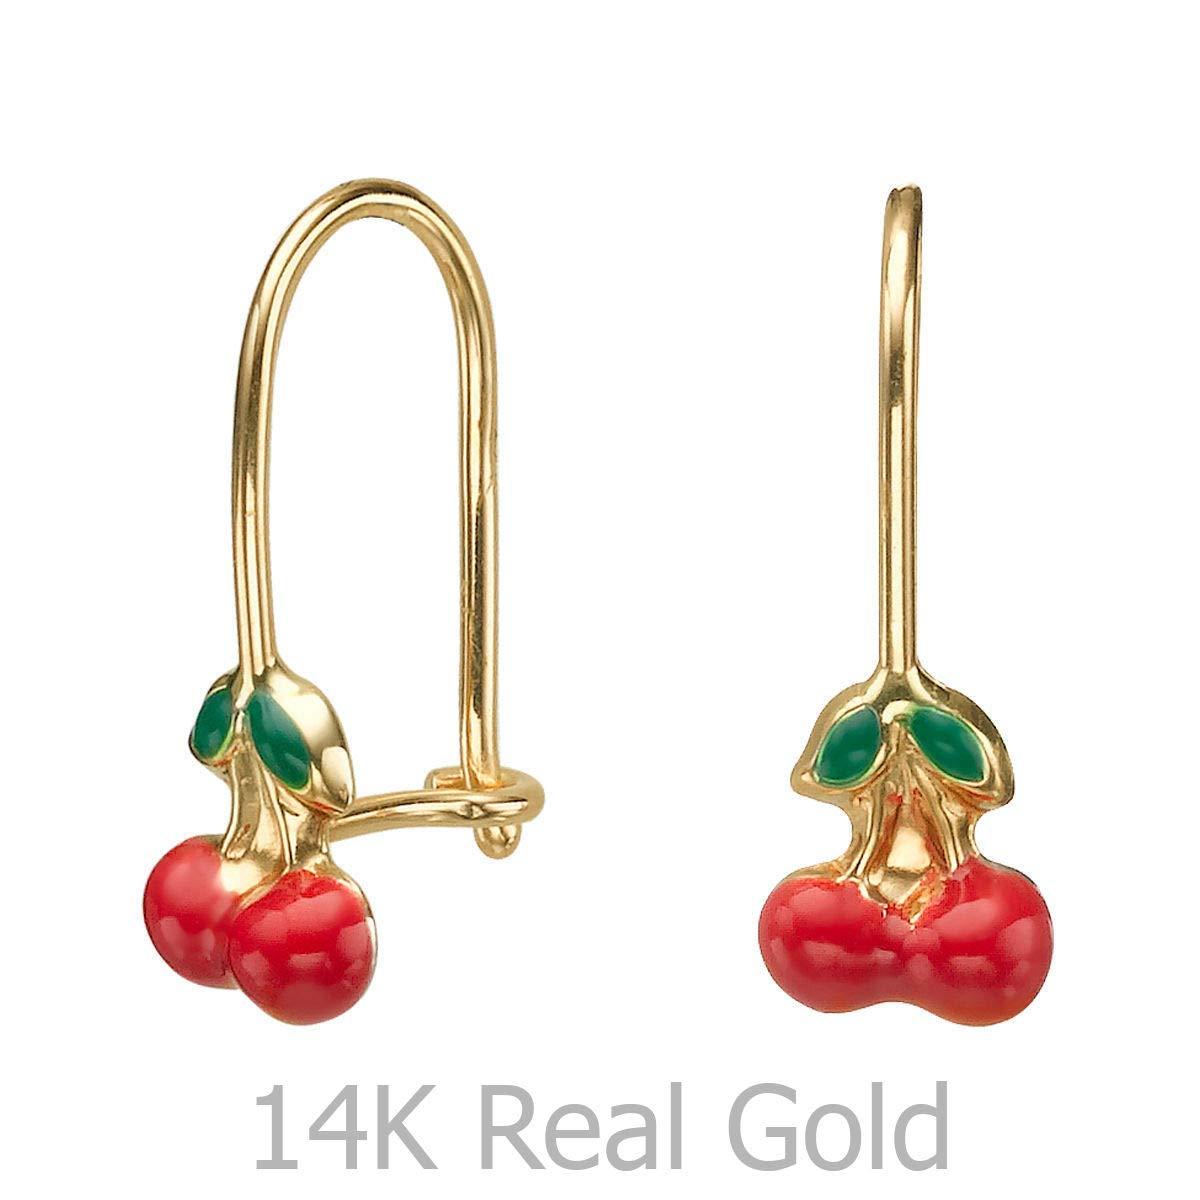 14K Solid Yellow Gold Eliptical Hoop Earrings Cherry Drop Children Kids Child Baby Gift Girls Teen